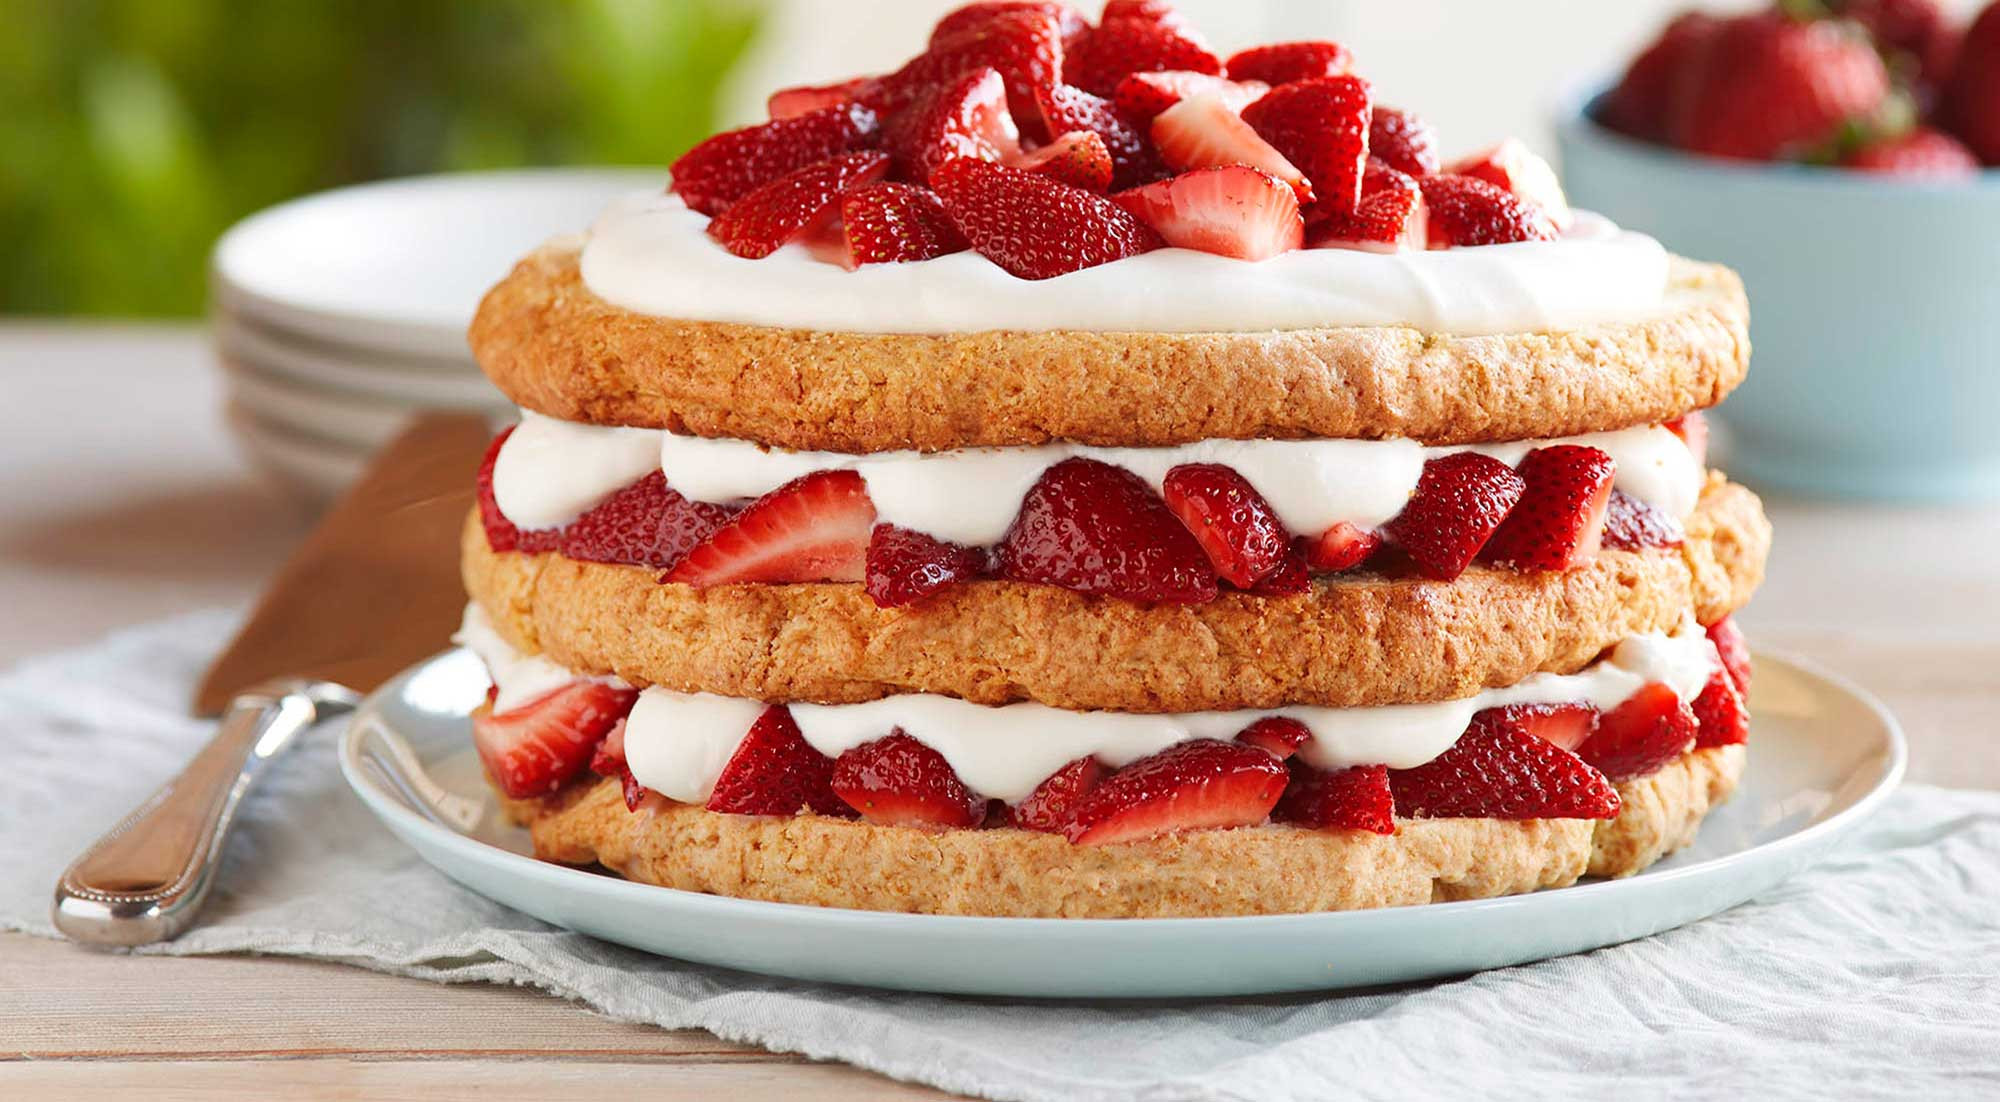 Strawberry Shortcake Dessert Recipes  Classic Strawberry Shortcake Recipe